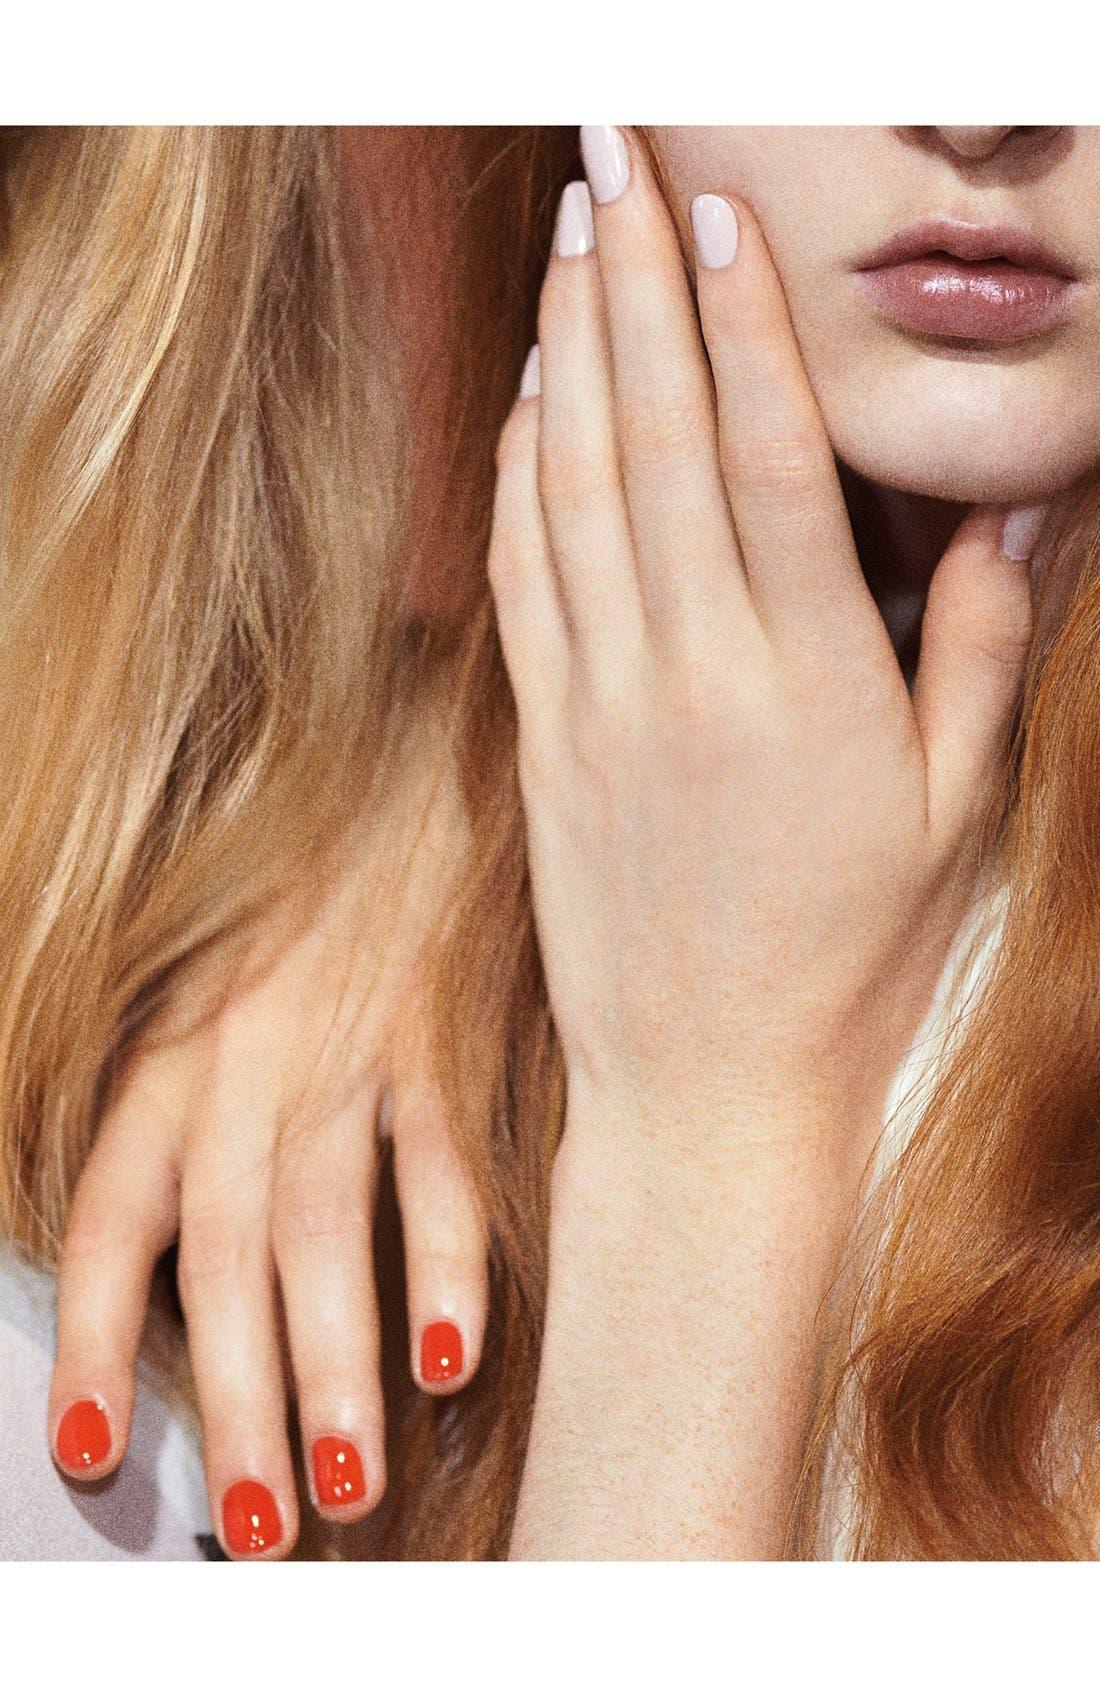 NAILS INC. LONDON,                             Victoria, Victoria Beckham for nails inc. London 'Bamboo White' Nail Polish,                             Alternate thumbnail 5, color,                             100